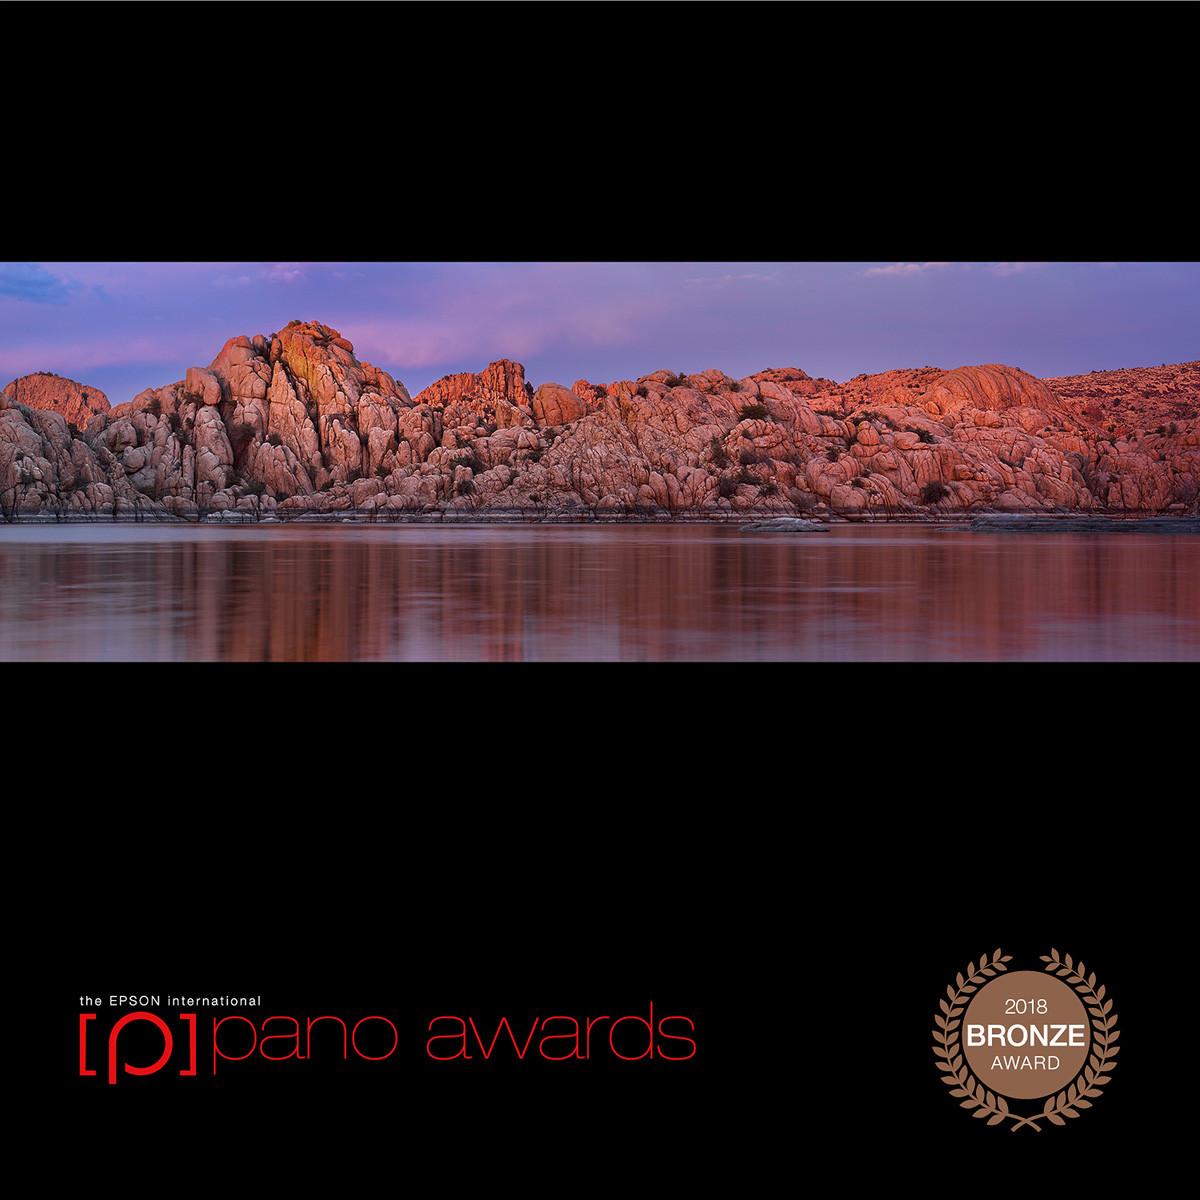 granite dells prescott arizona water rocks reflection award winning photography sunset epson panorama award